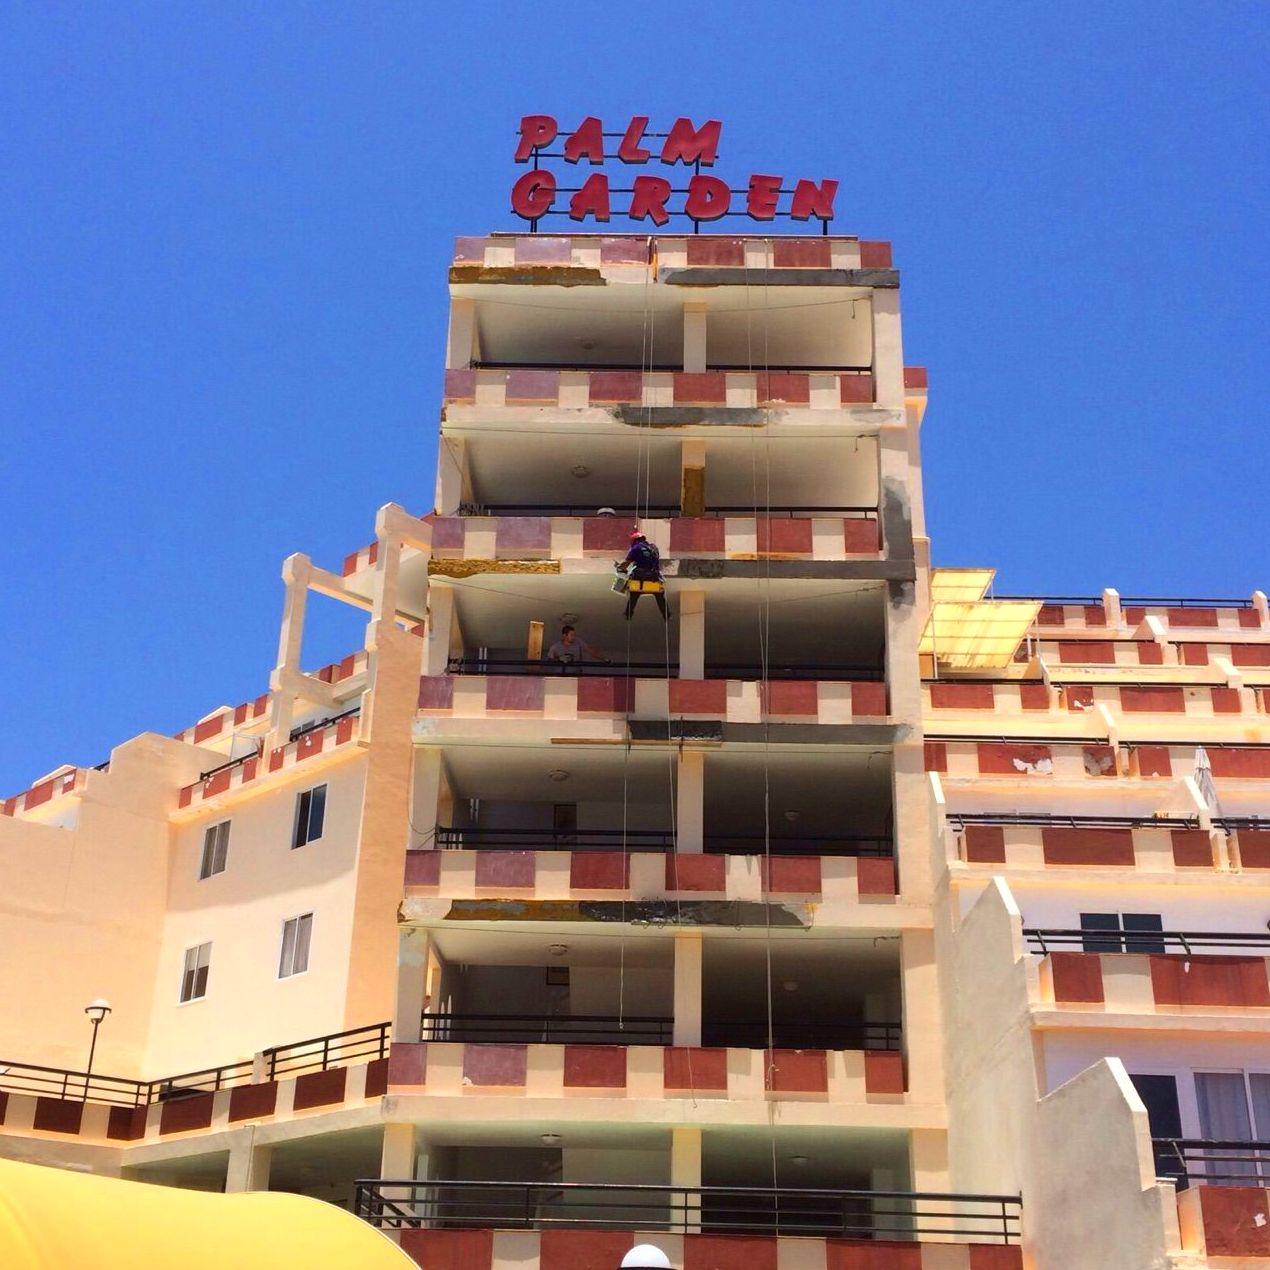 Rehabilitación y pintado de fachada (Hotel Palm Garden, Fuerteventura)